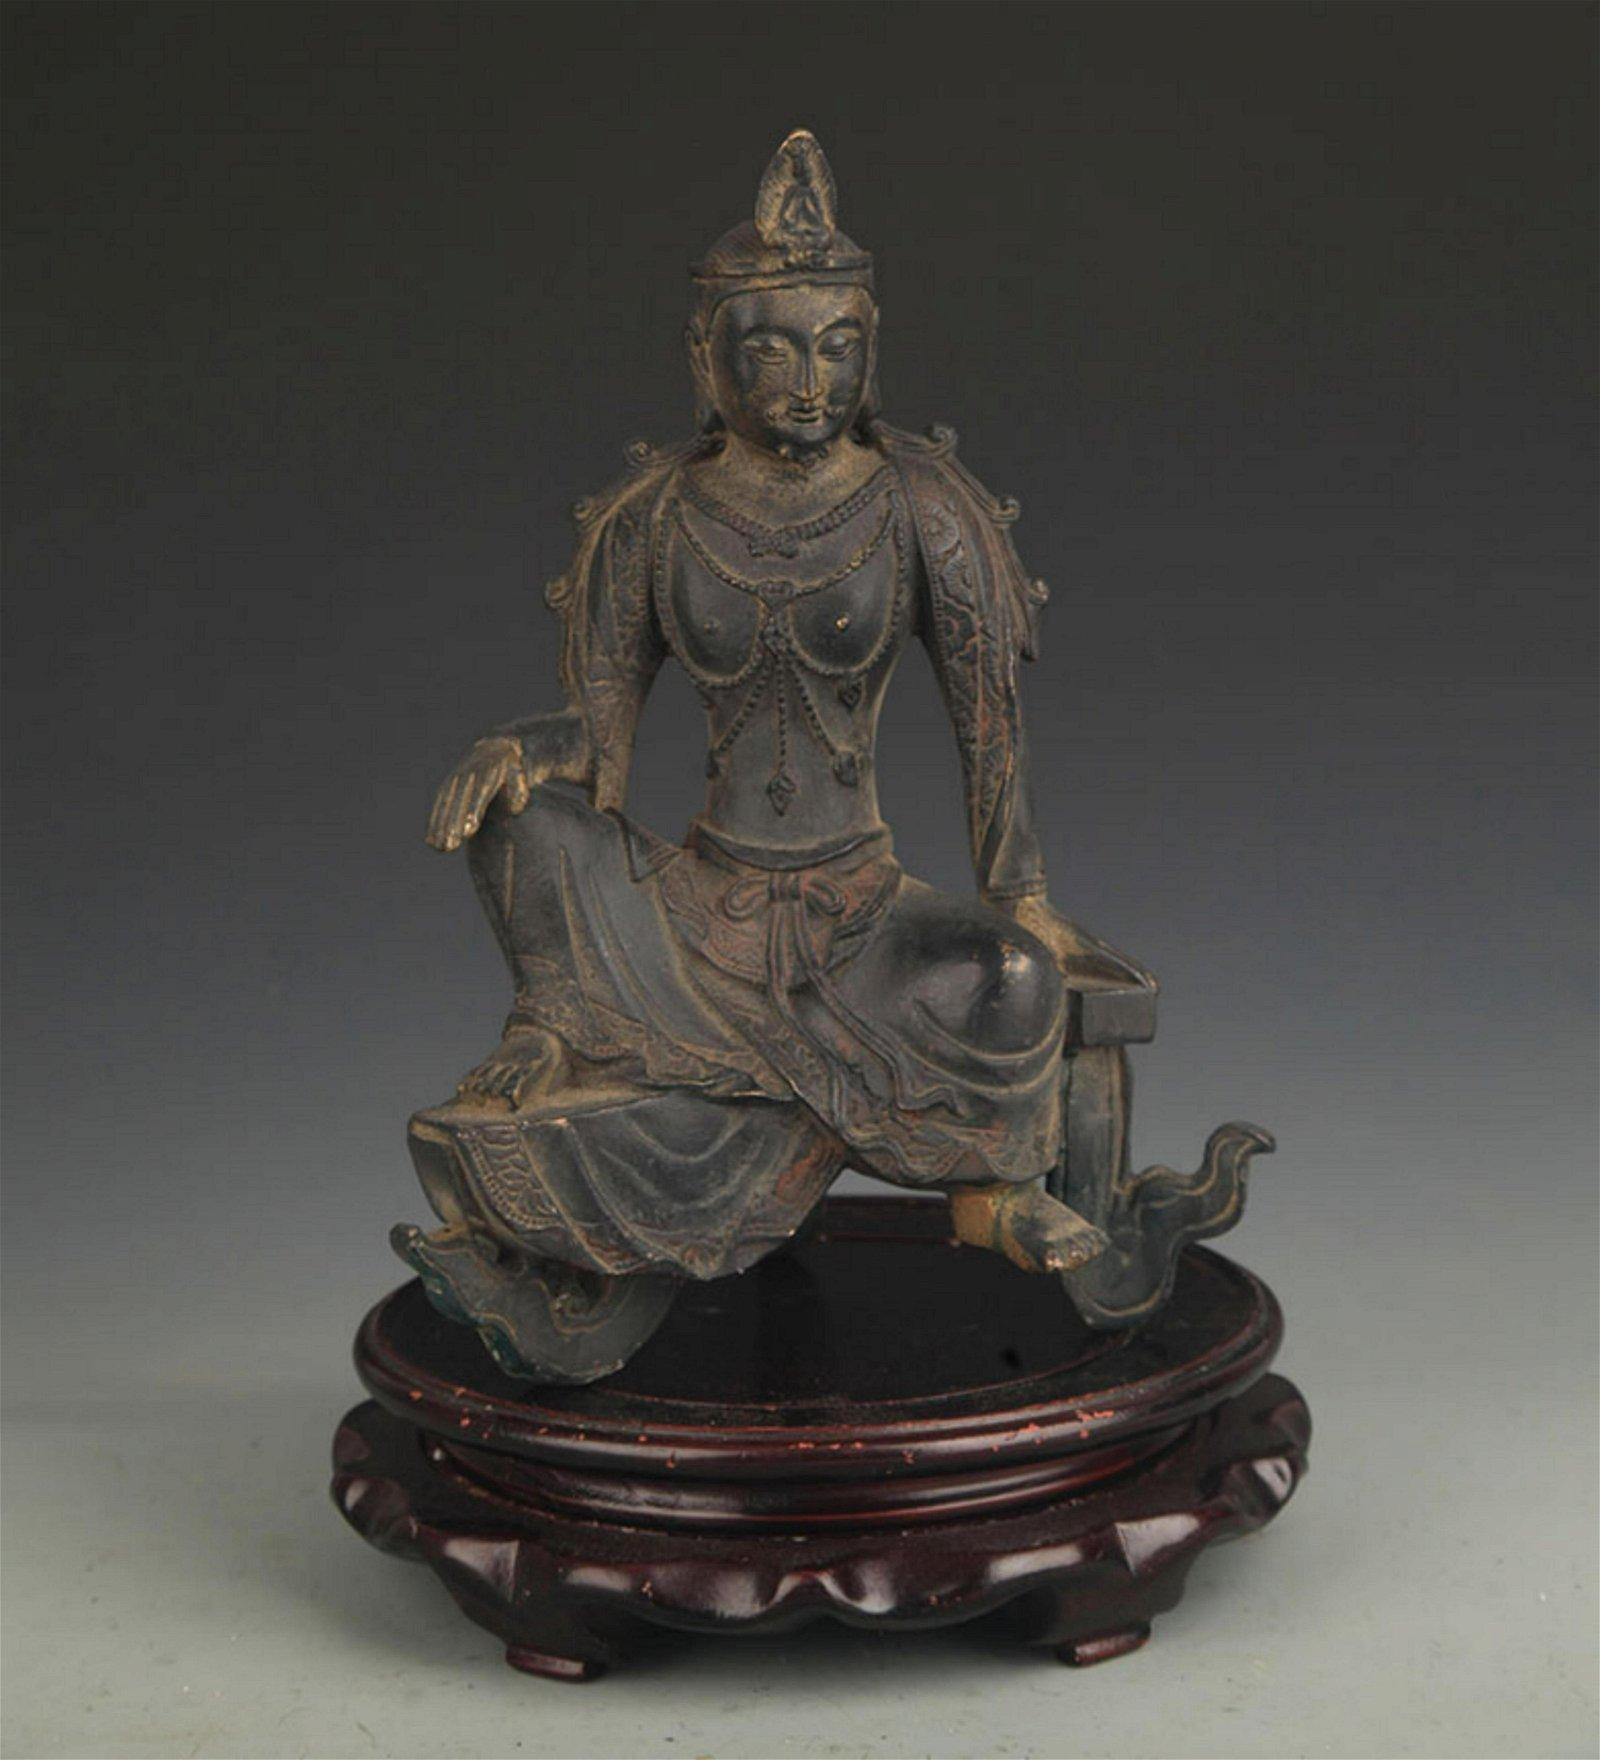 A FINE BRONZE SEATED BUDDHA FIGURE